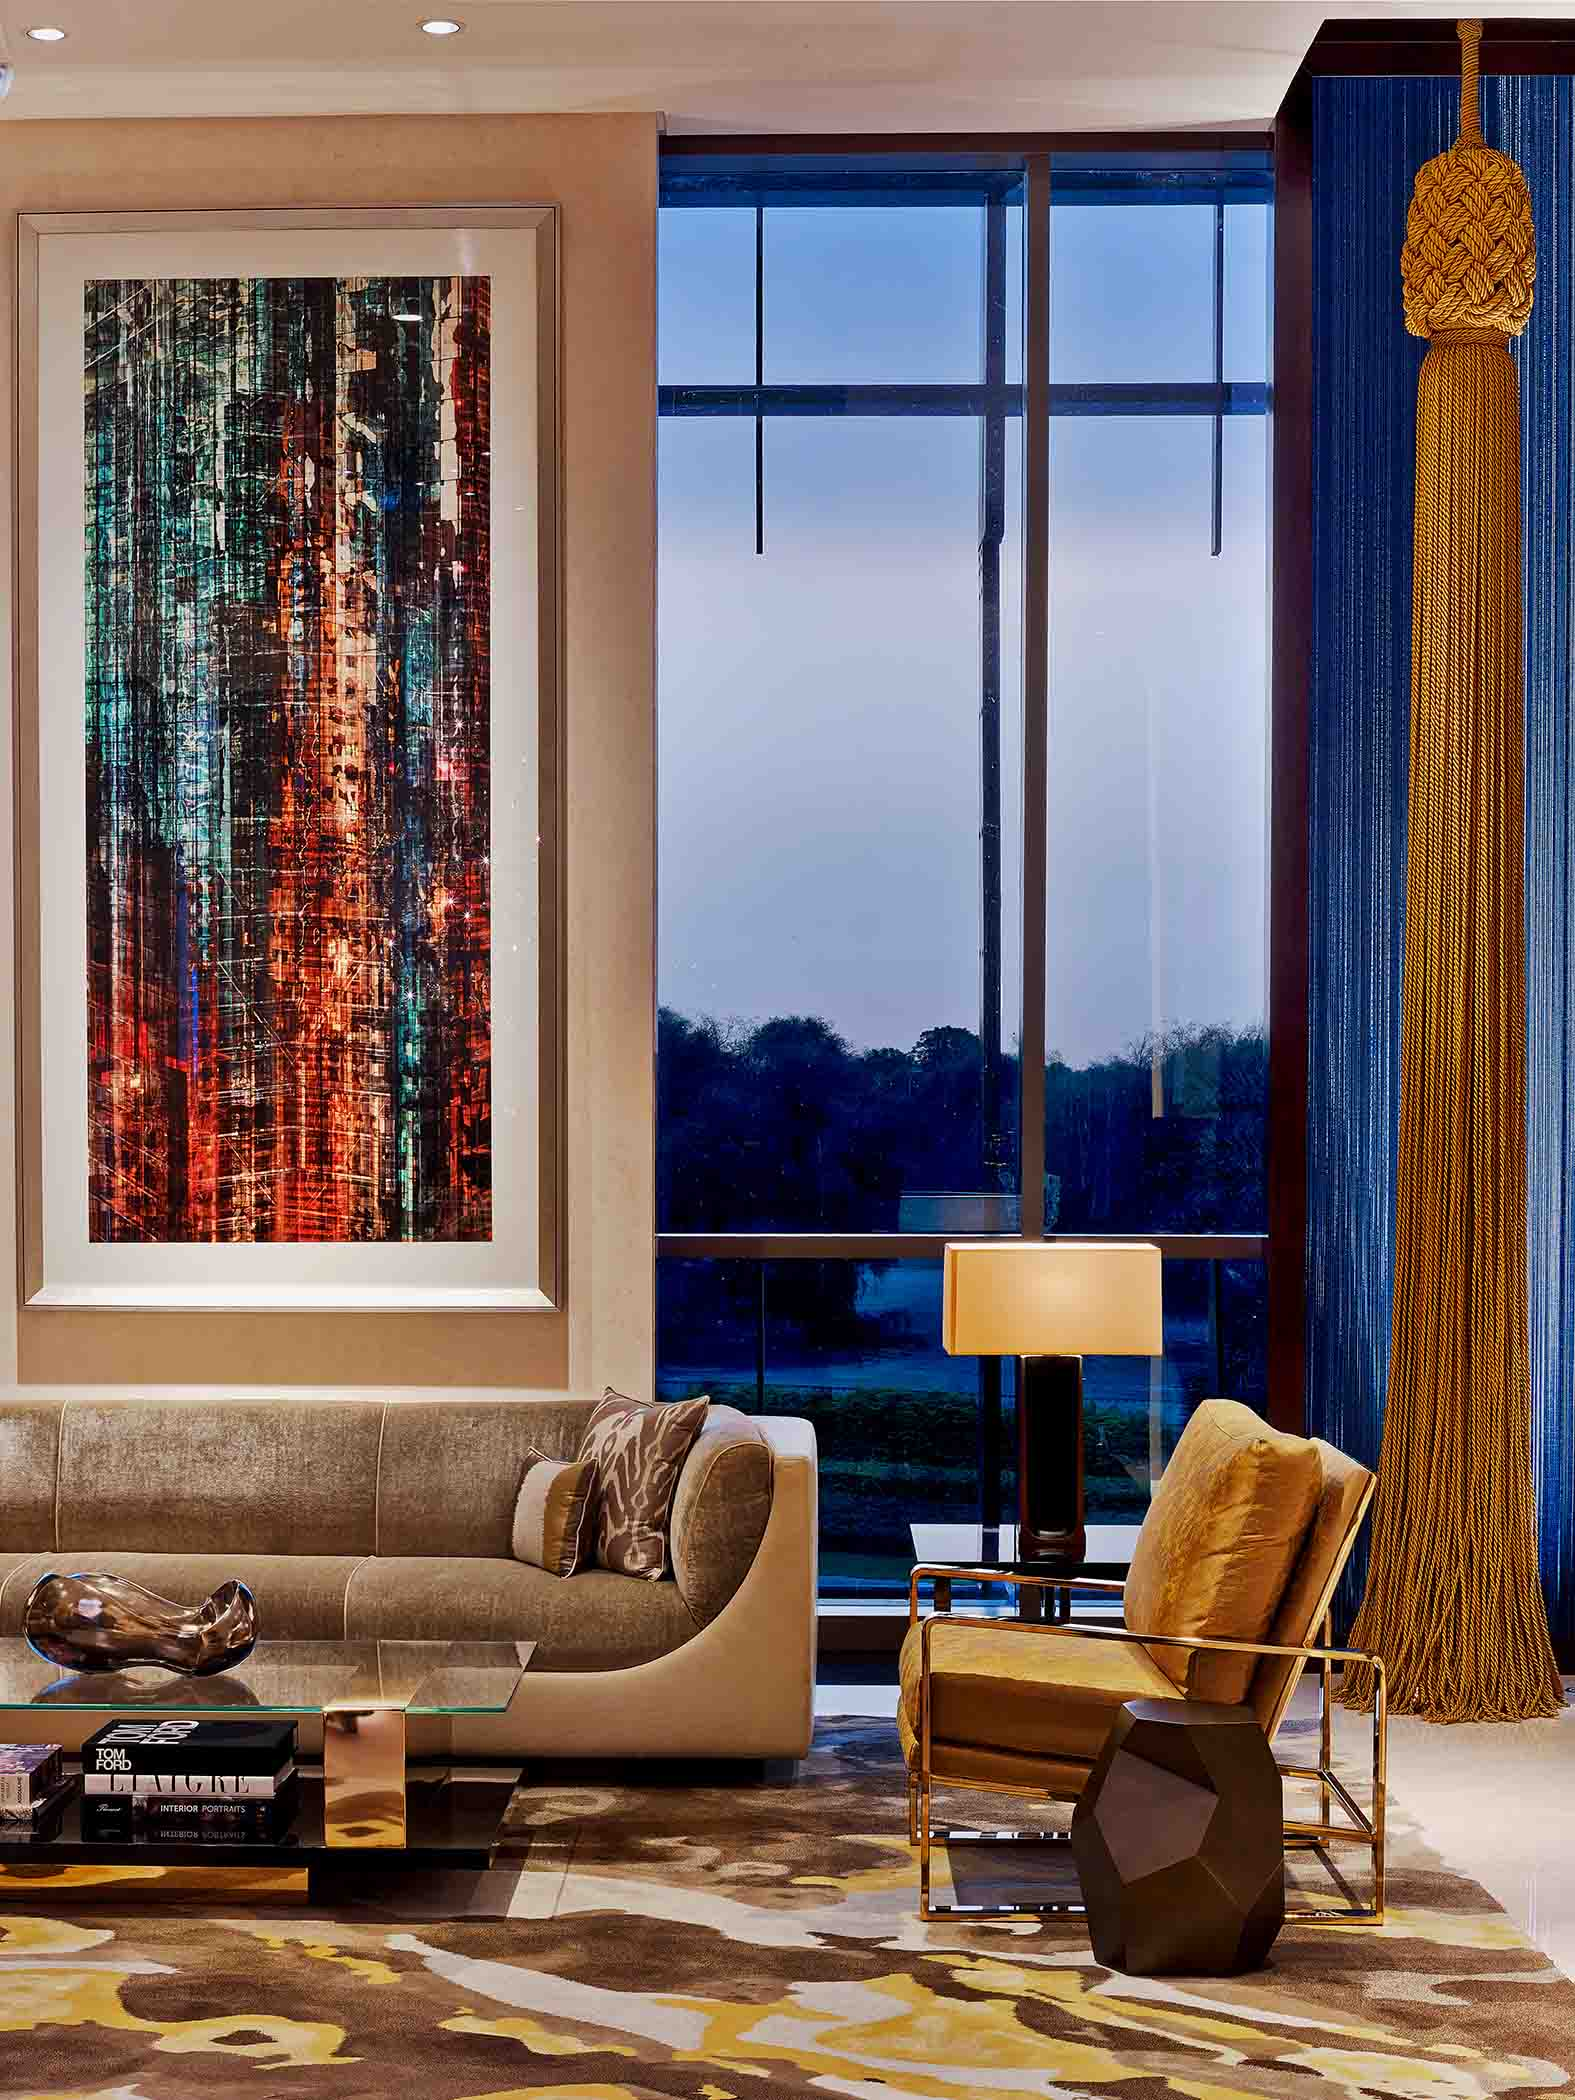 Sophie-Mallebranche-Wall-Covering-Hospitality-Four-Seasons-Dubai-DIFC-Luxury